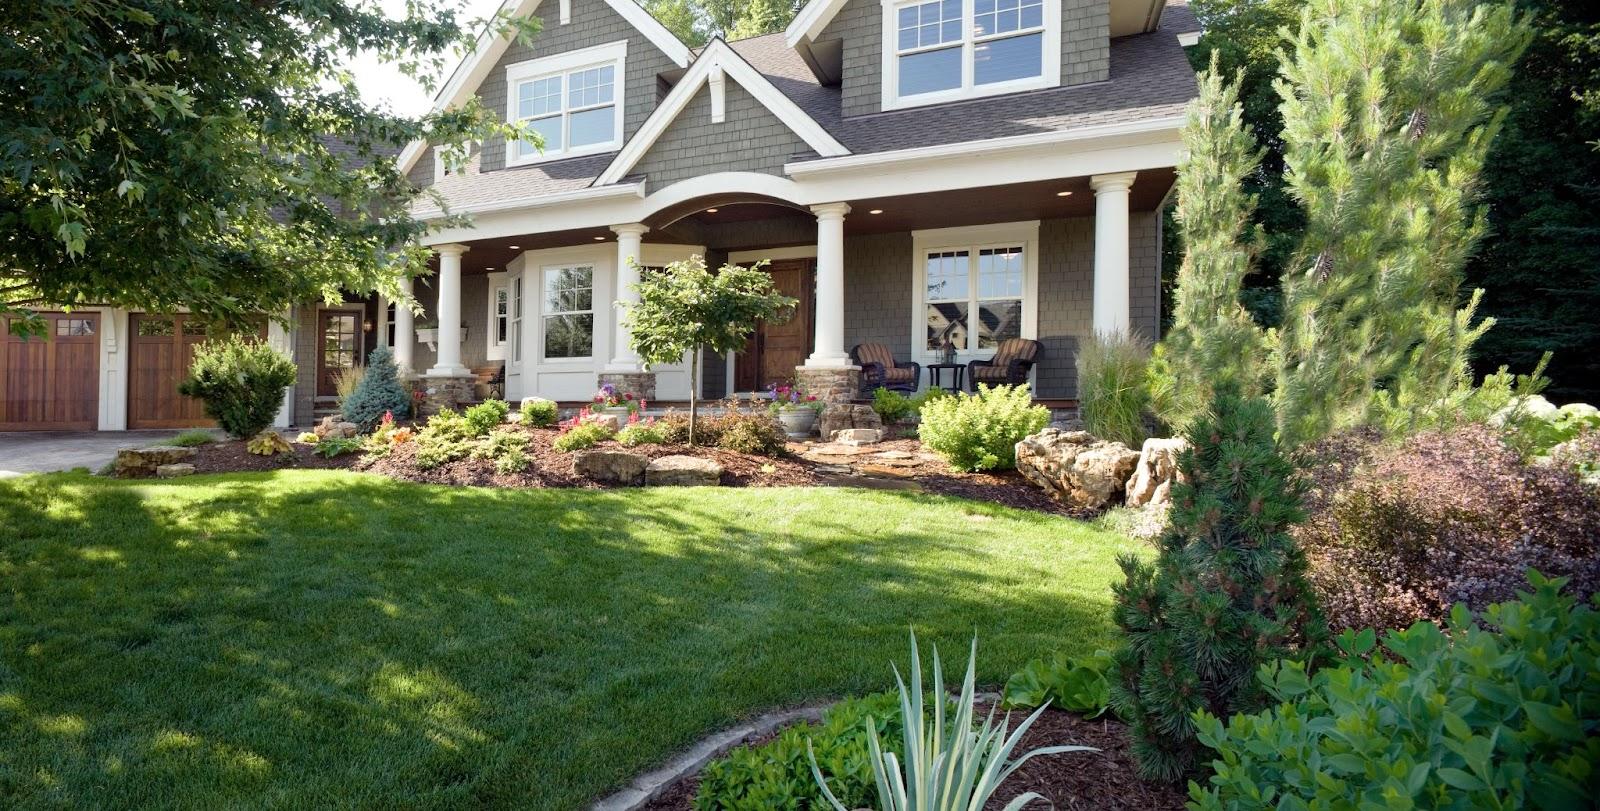 Patio-ideas-Minneapolis-landscaping-outdoors